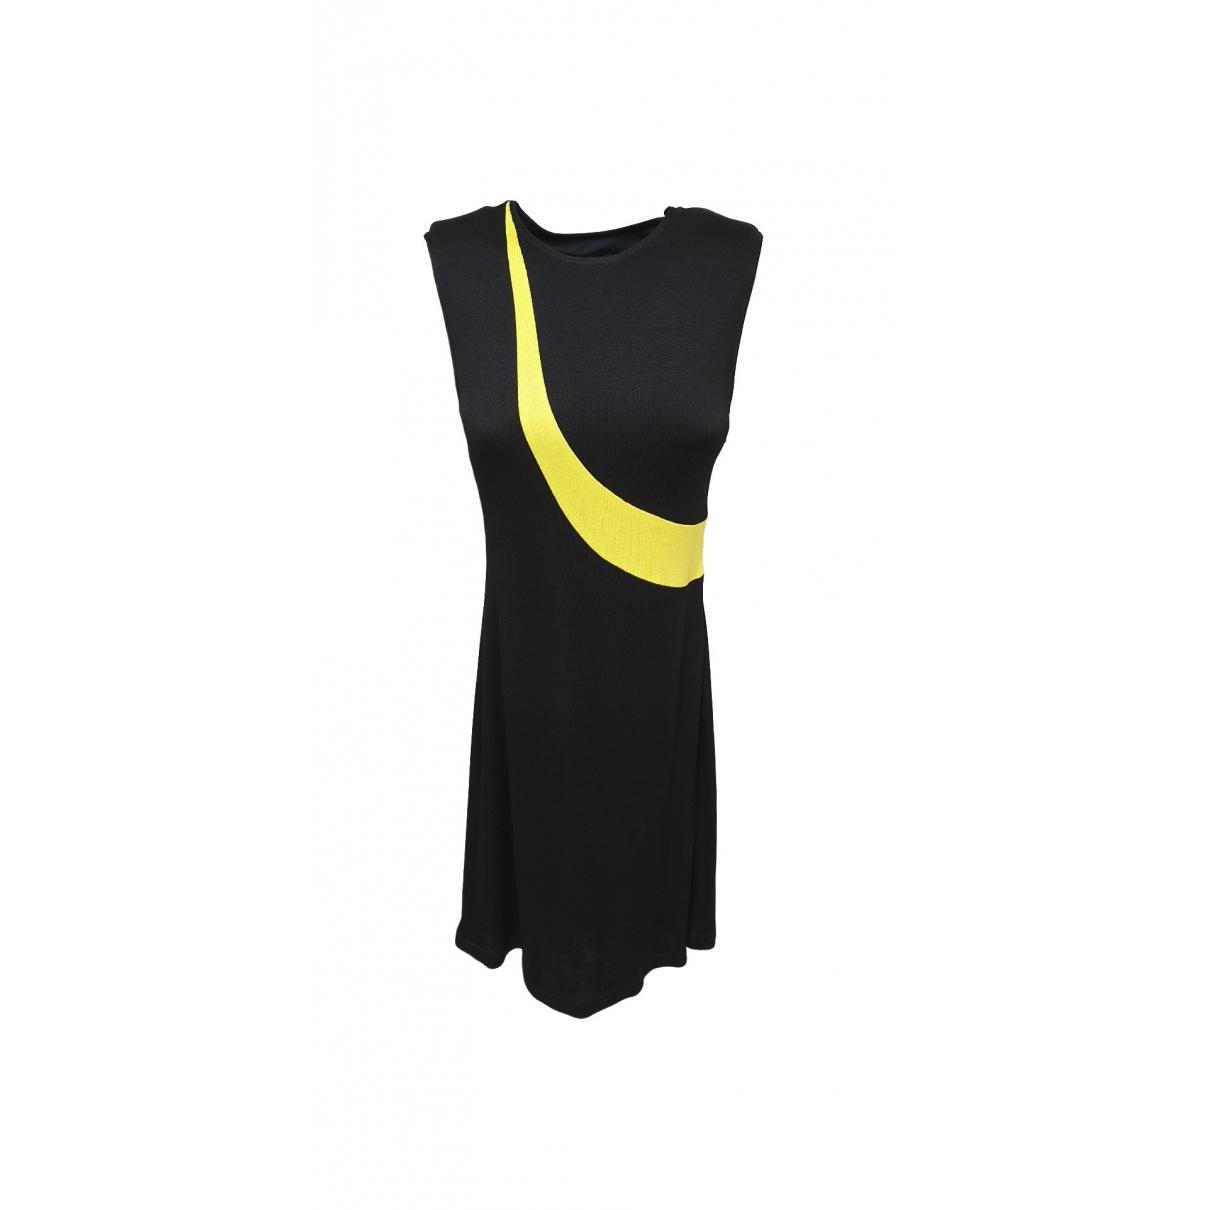 Gianni Versace \N Kleid in  Schwarz Synthetik